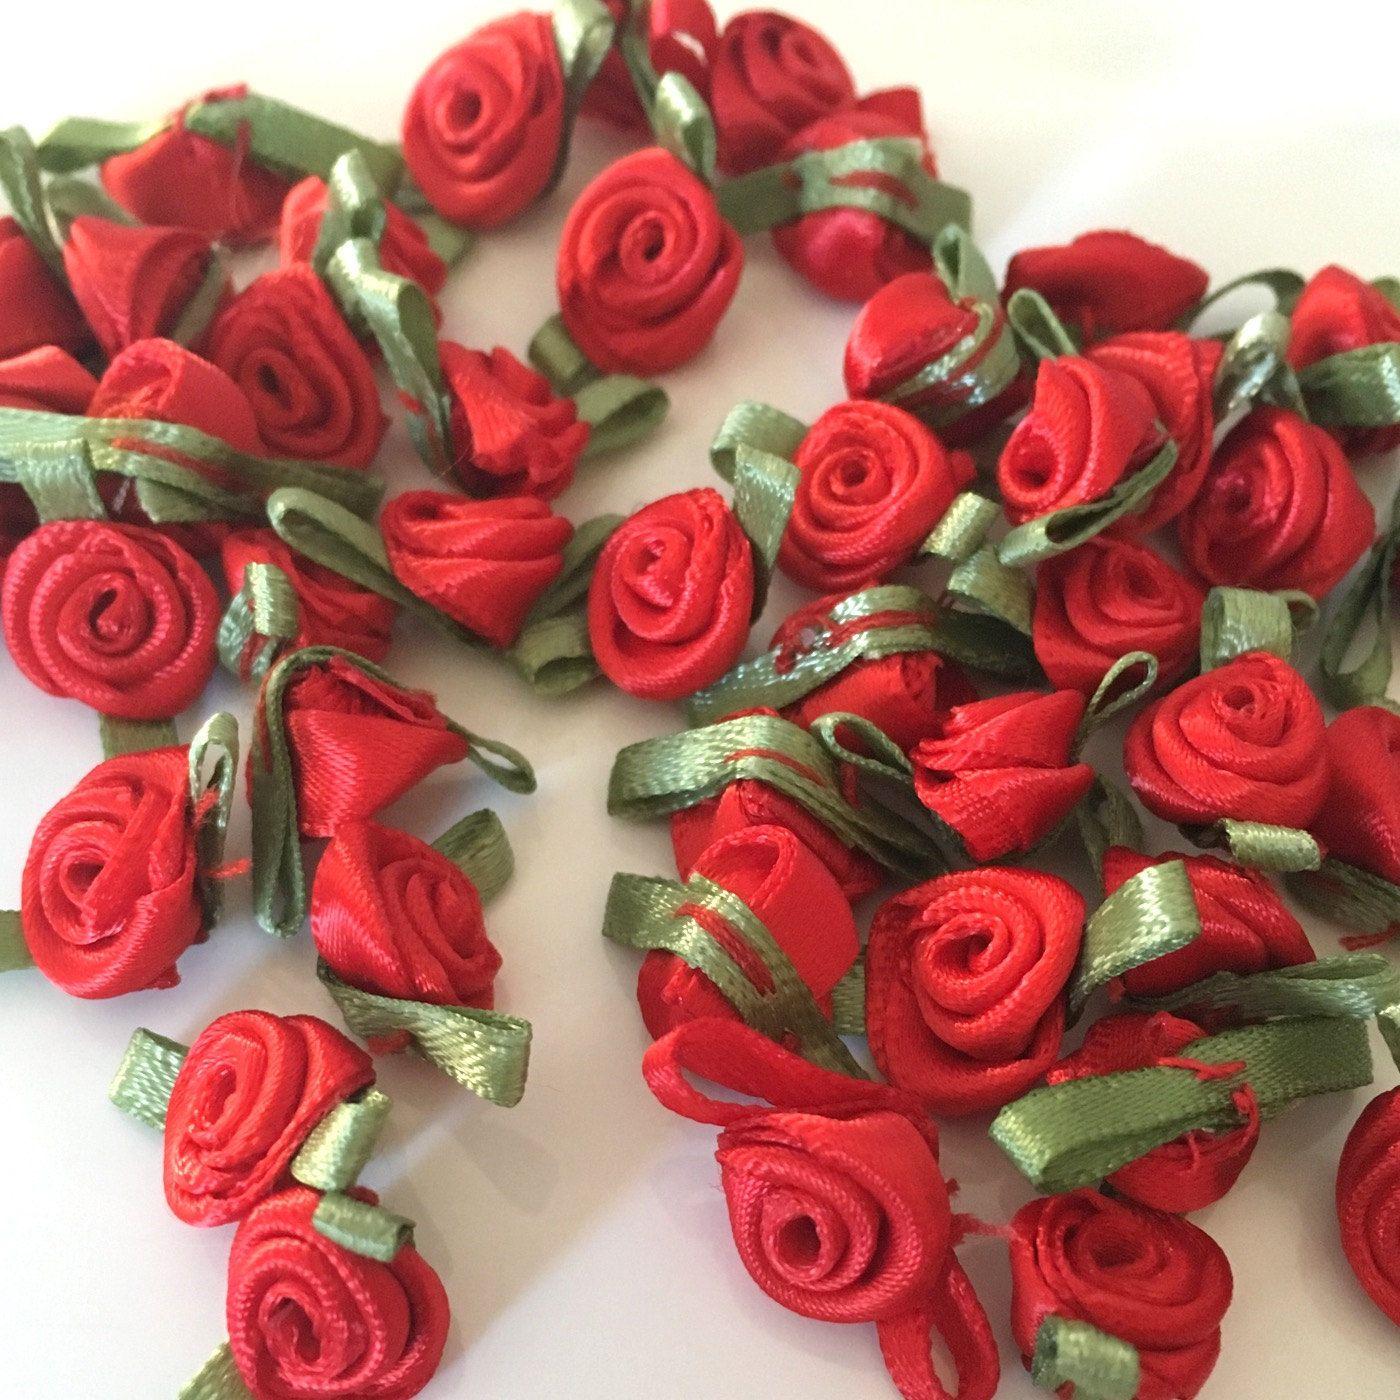 20 red ribbon roses satin ribbon roses red satin roses sew on